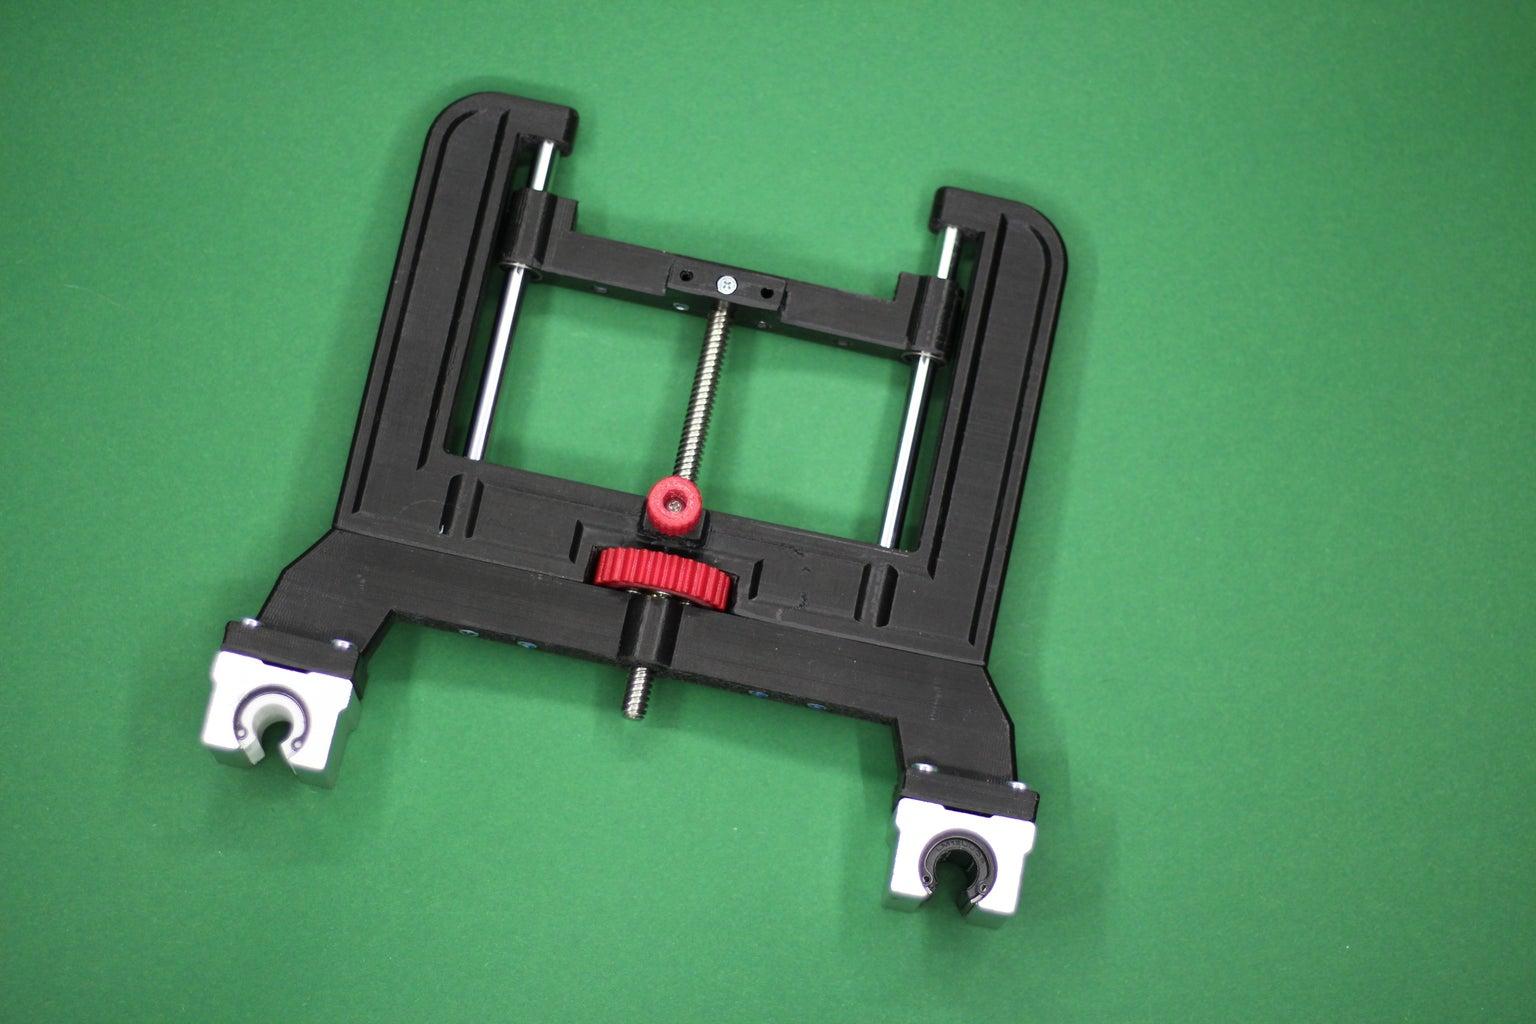 Assembling the Right Bracket